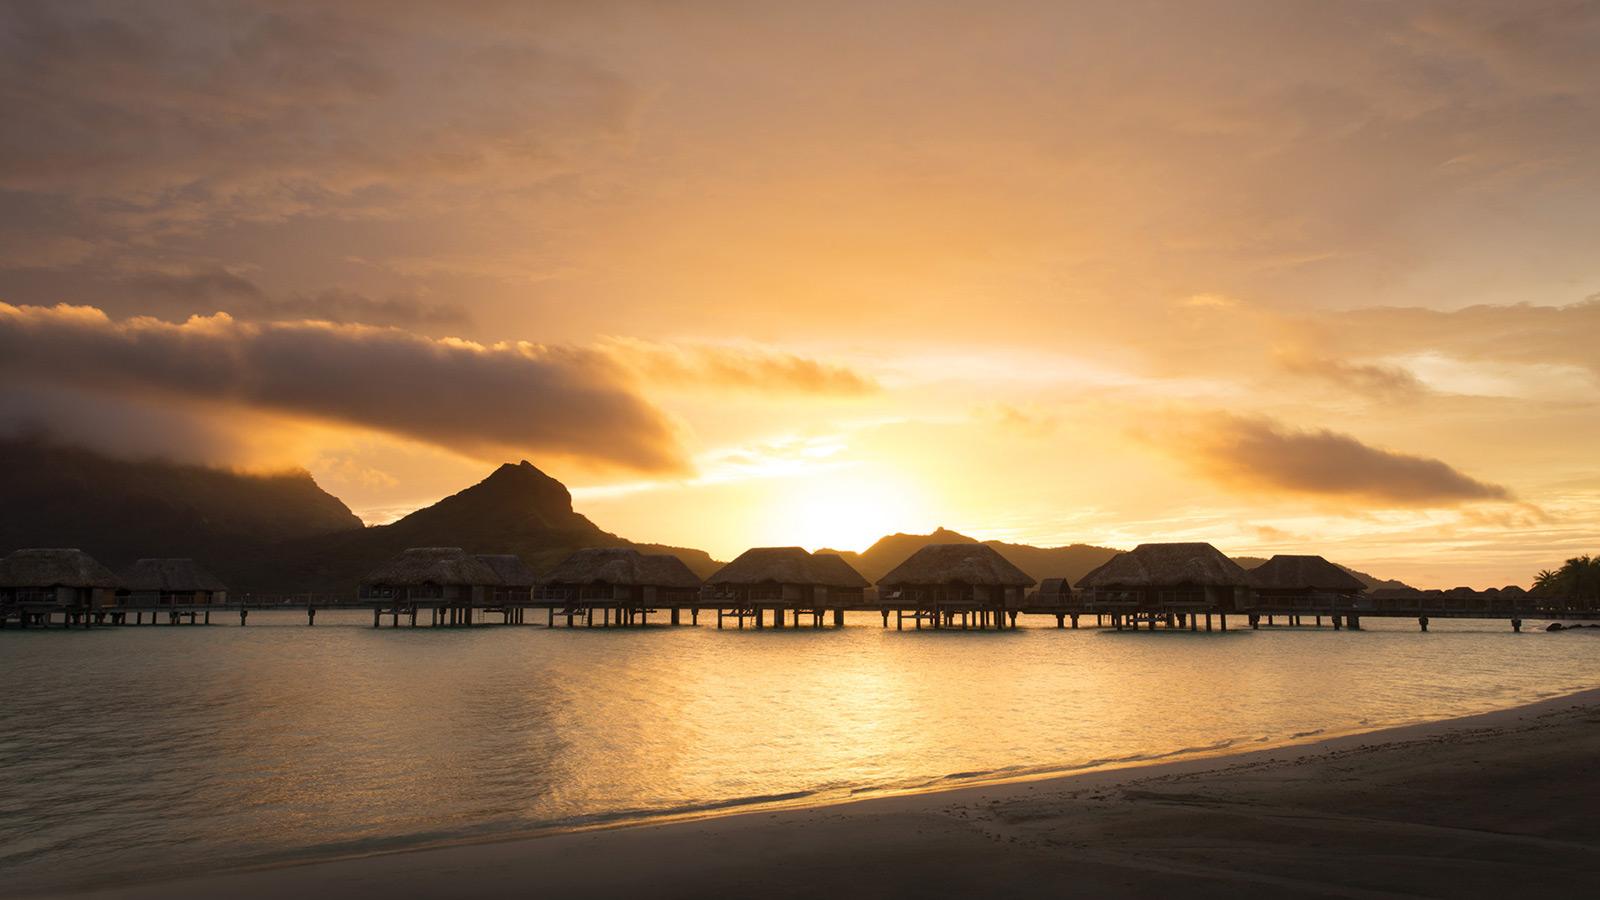 Bora Bora Vacation Resort 5 Star Four Seasons Resort Bora Bora